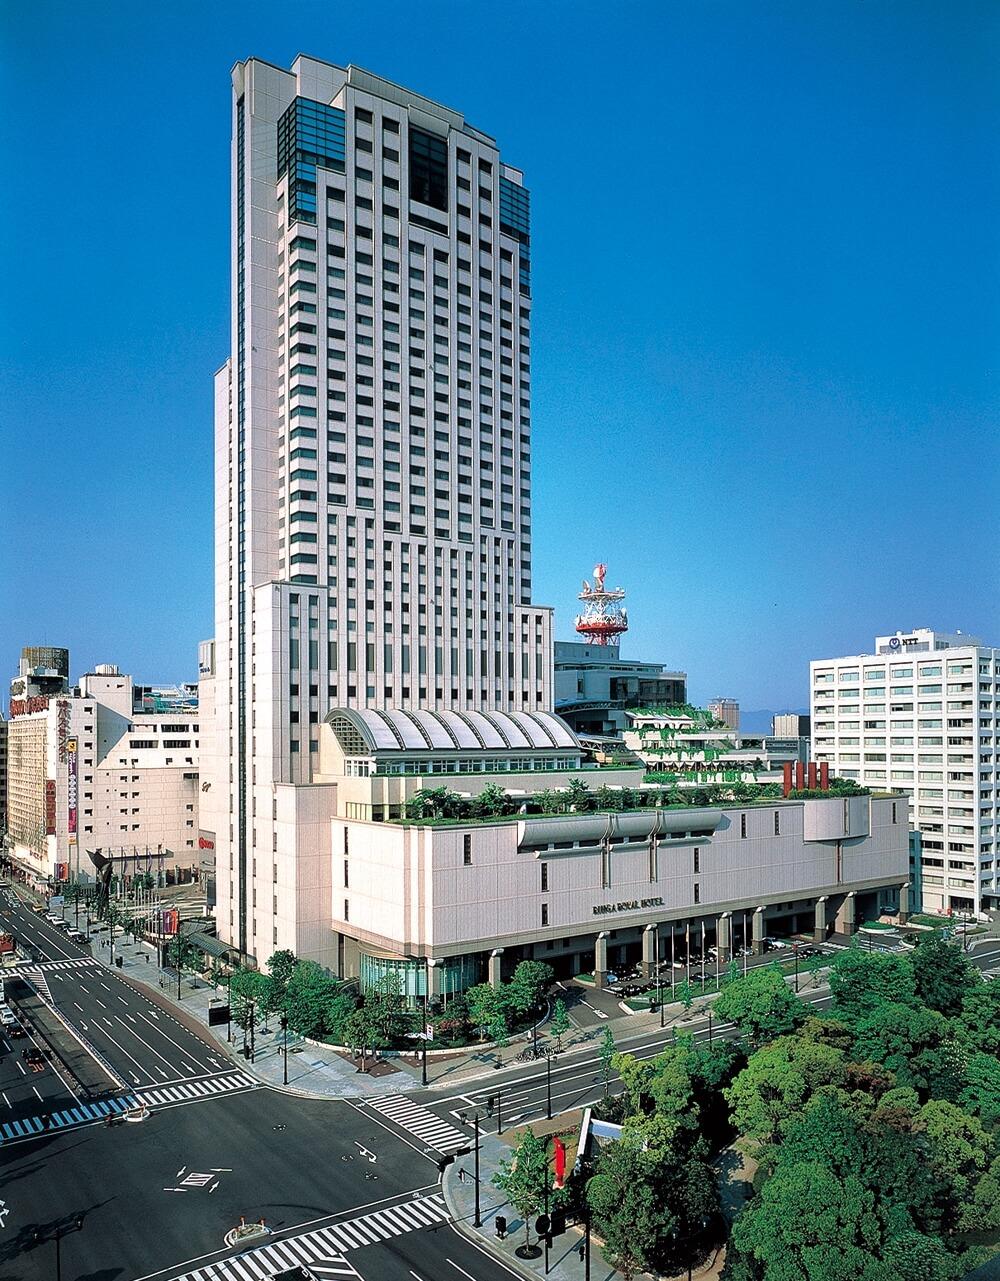 Hotel Rihga Royal Hiroshima